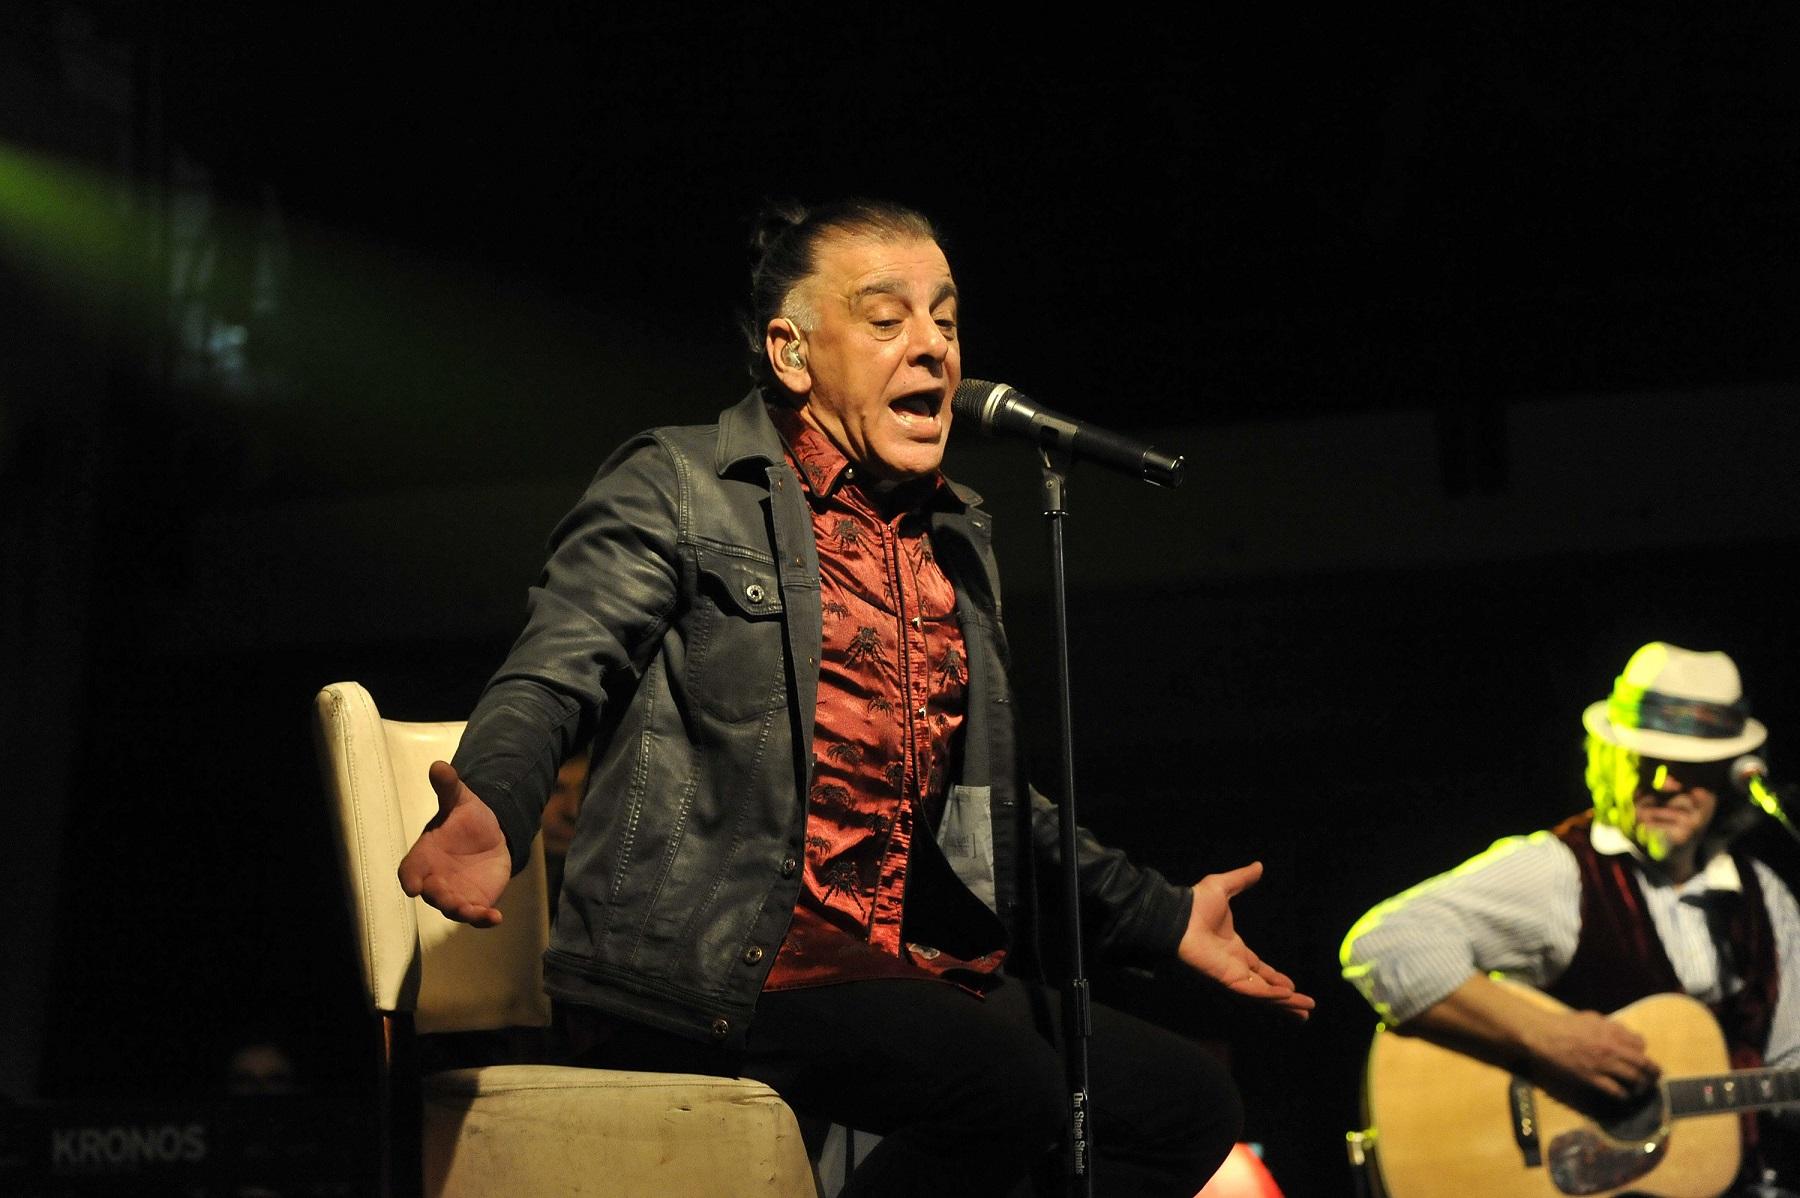 Zadar, 260216. Veceras je u prepunom klubu Arsenal odrzan unplugged koncert Parnog valjka. Foto: Luka Gerlanc / CROPIX